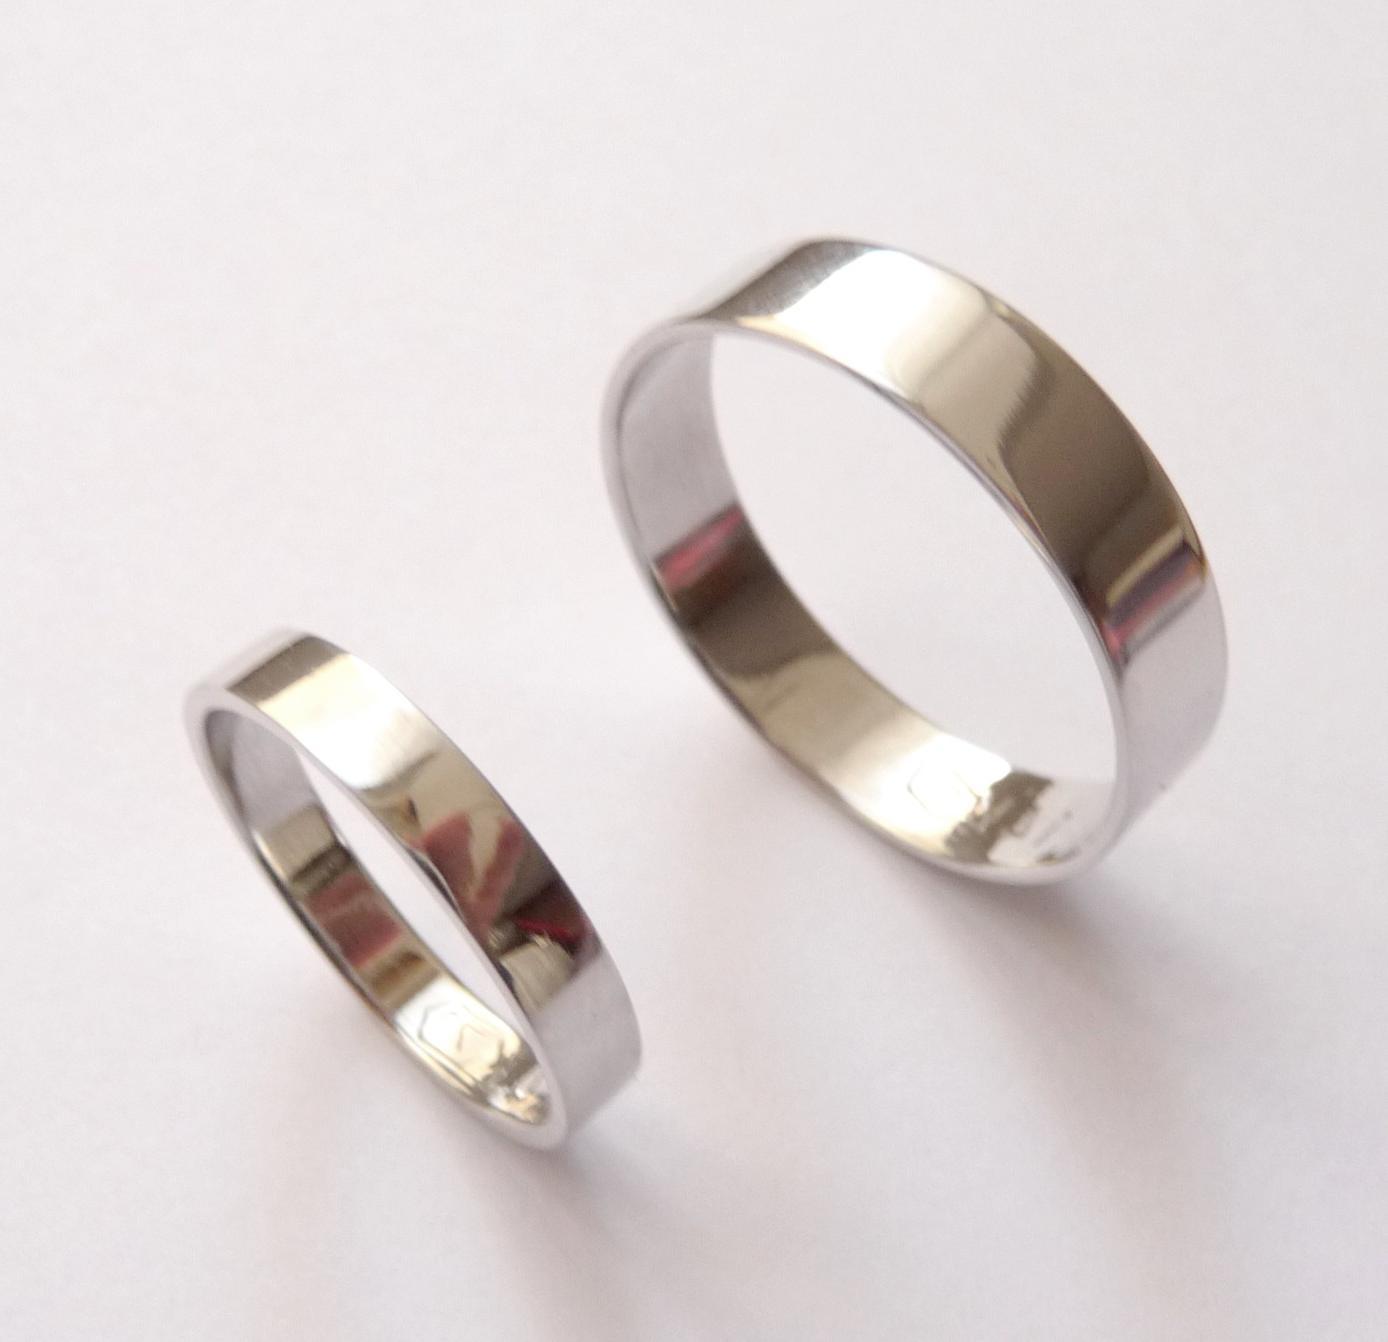 White gold wedding bands set